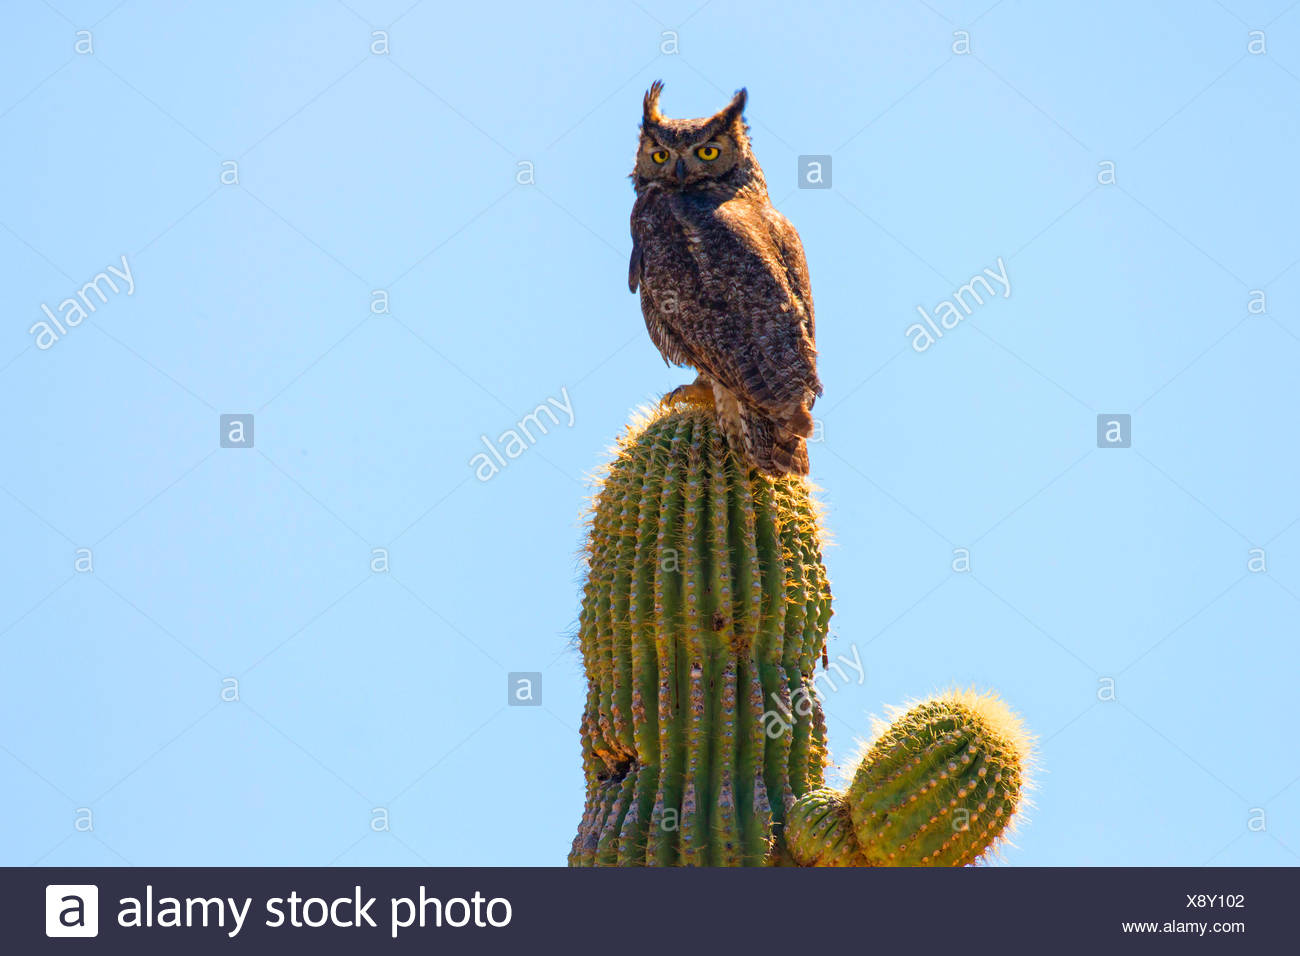 Grande gufo cornuto (Bubo virginianus), ontip di un cactus Saguaro, USA, Arizona, Phoenix Immagini Stock